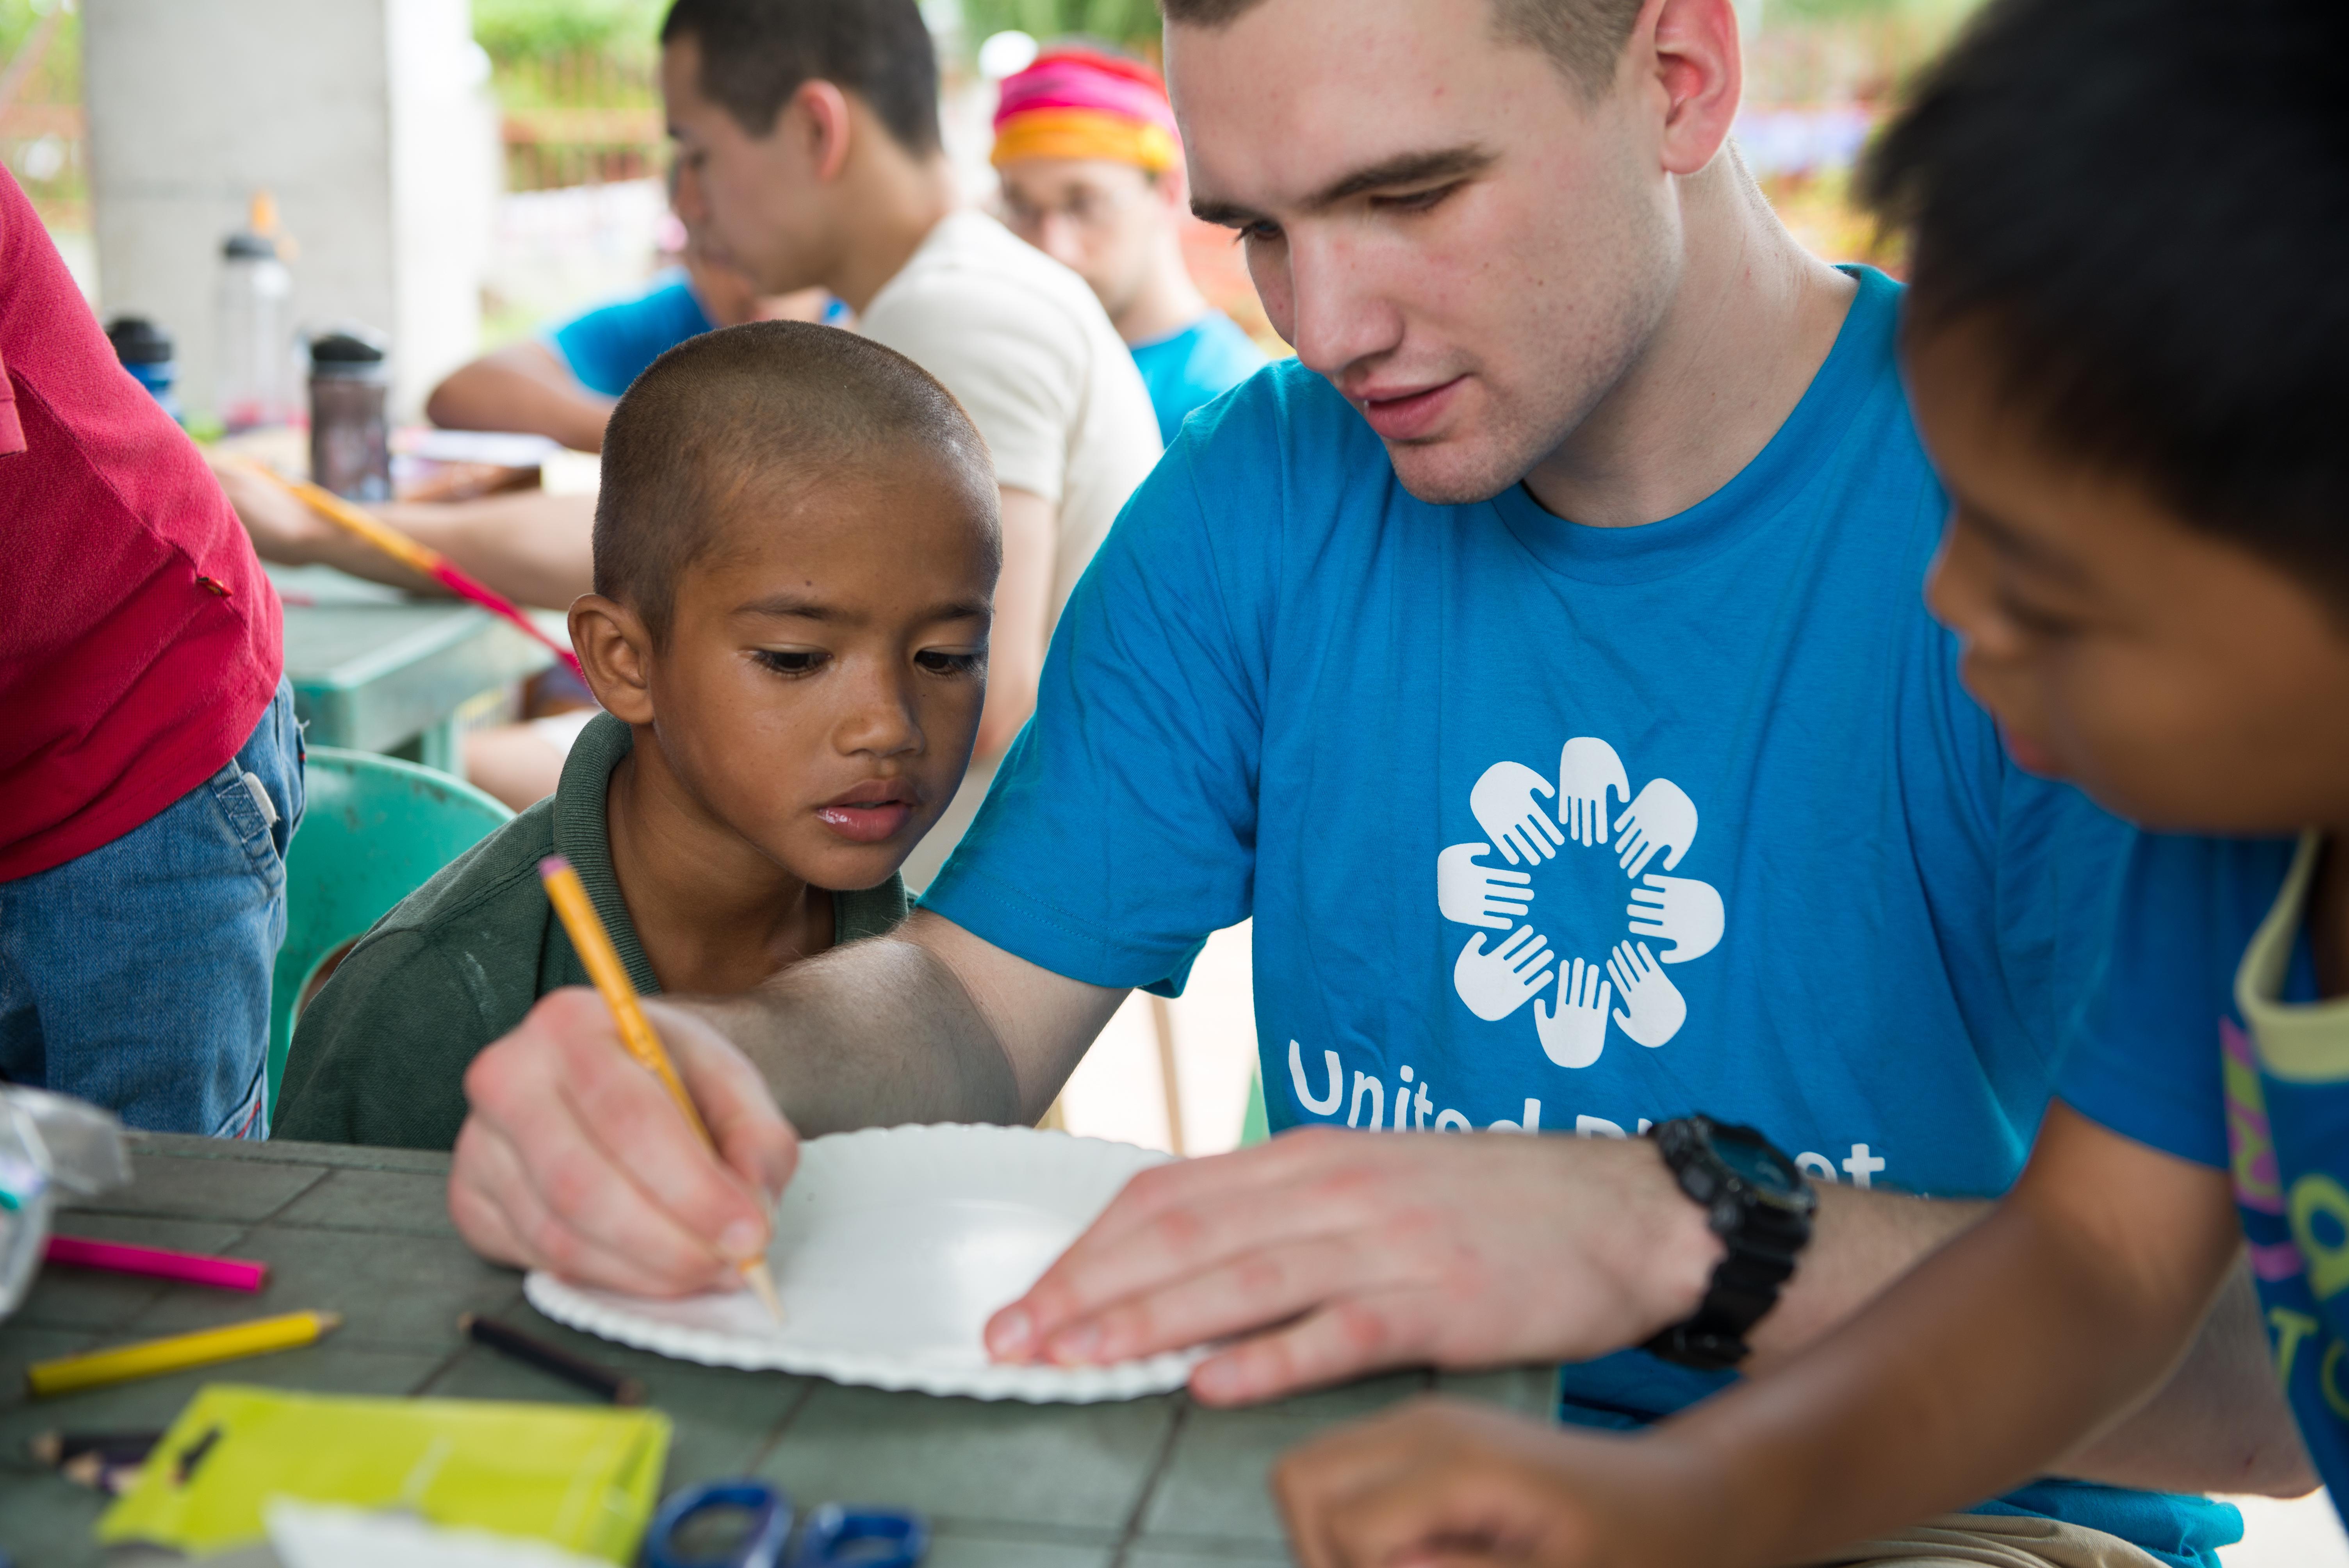 Gap Year Program - United Planet: Gap Year Abroad Volunteering  7